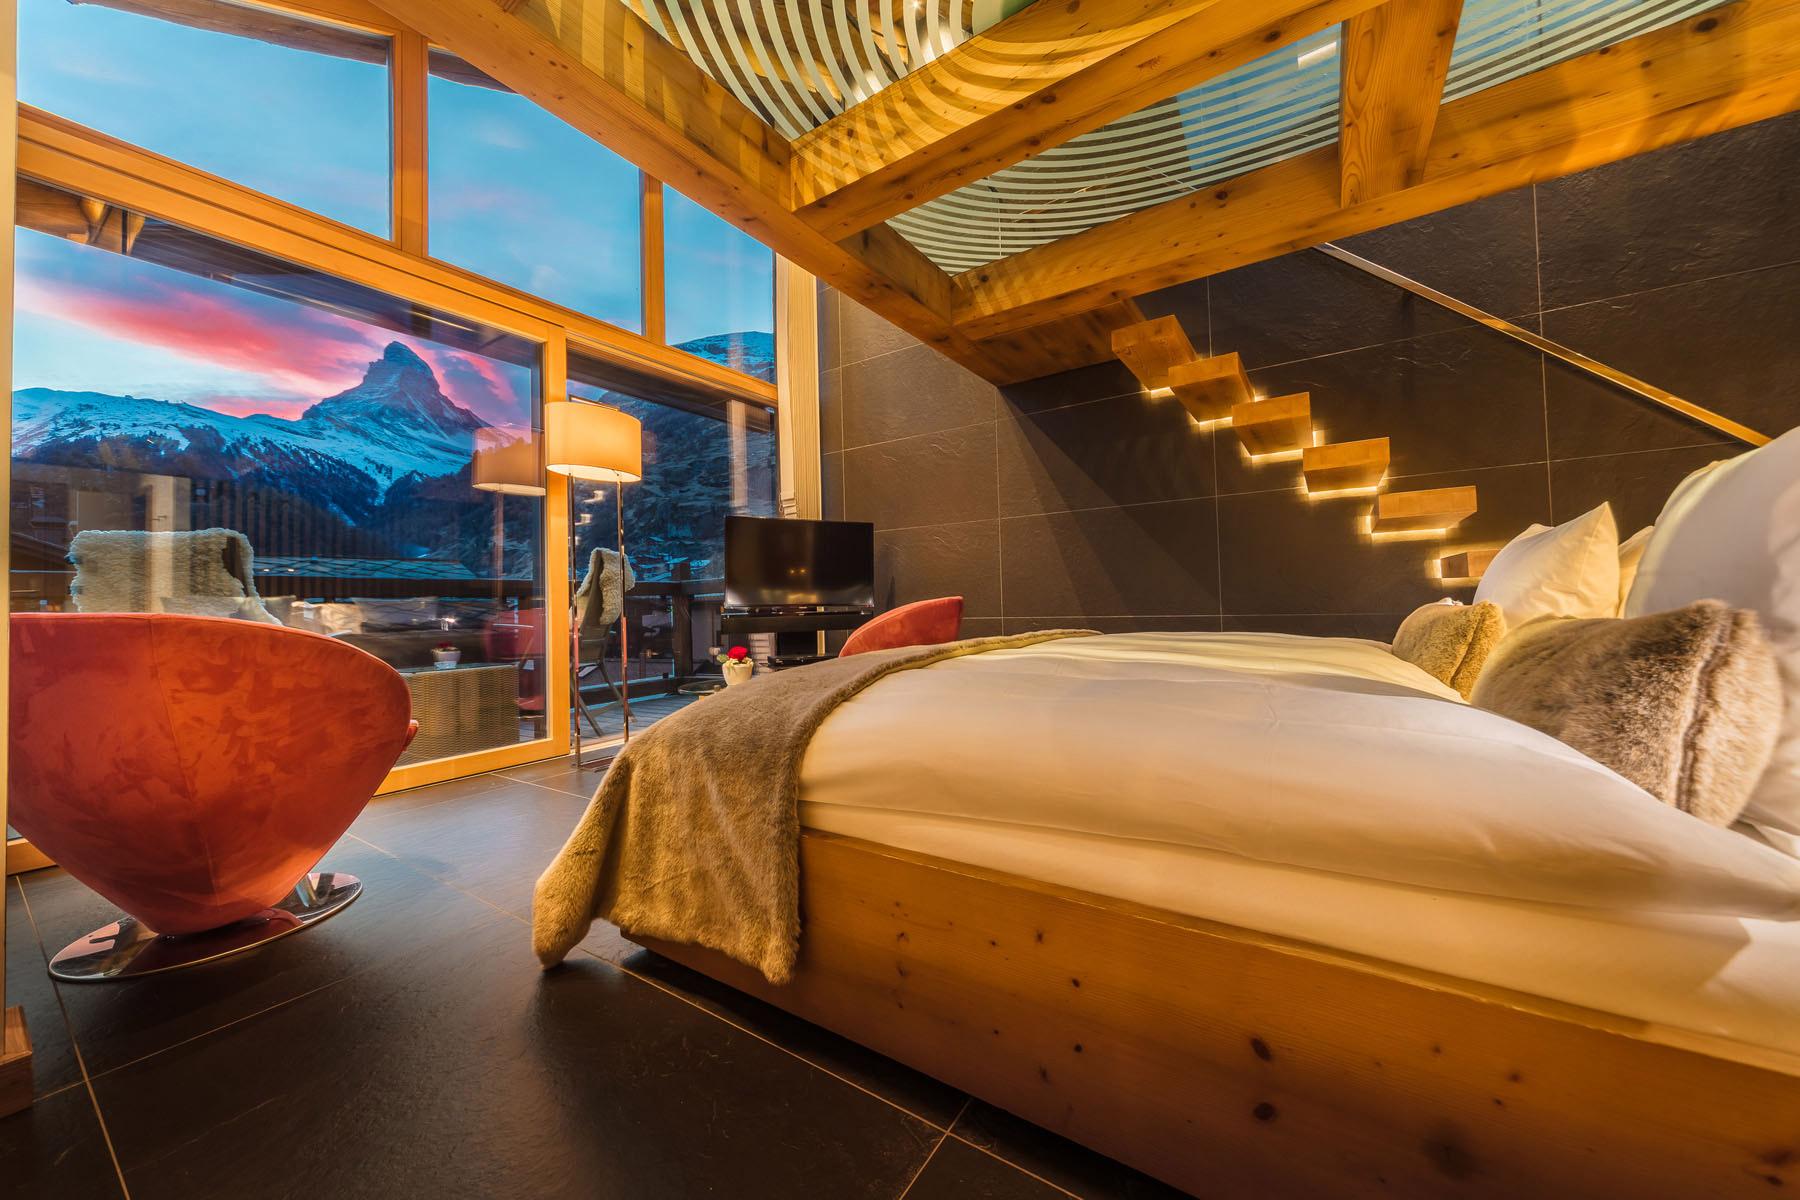 hotel bellerive zermatt urlaub in zermatt am matterhorn. Black Bedroom Furniture Sets. Home Design Ideas